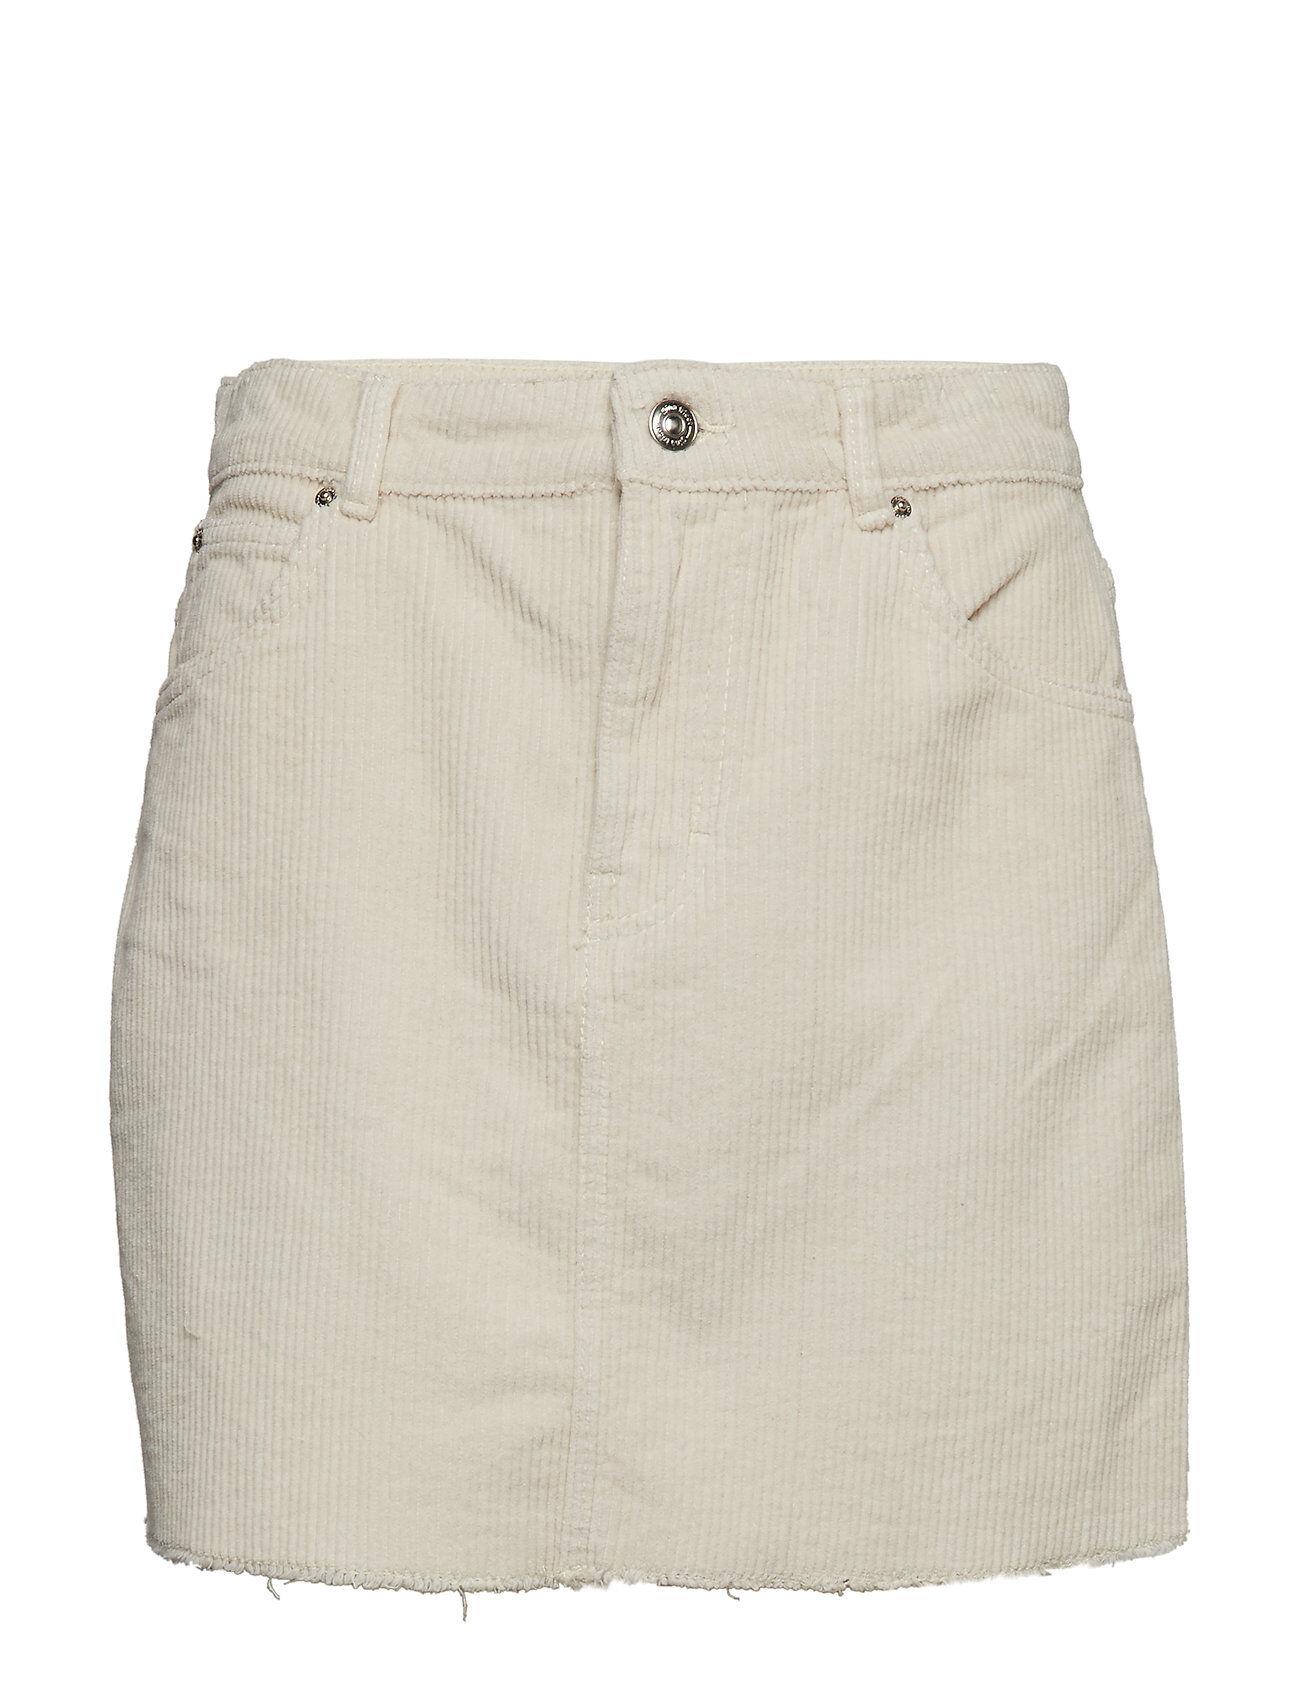 Gina Tricot Cory Corduroy Skirt